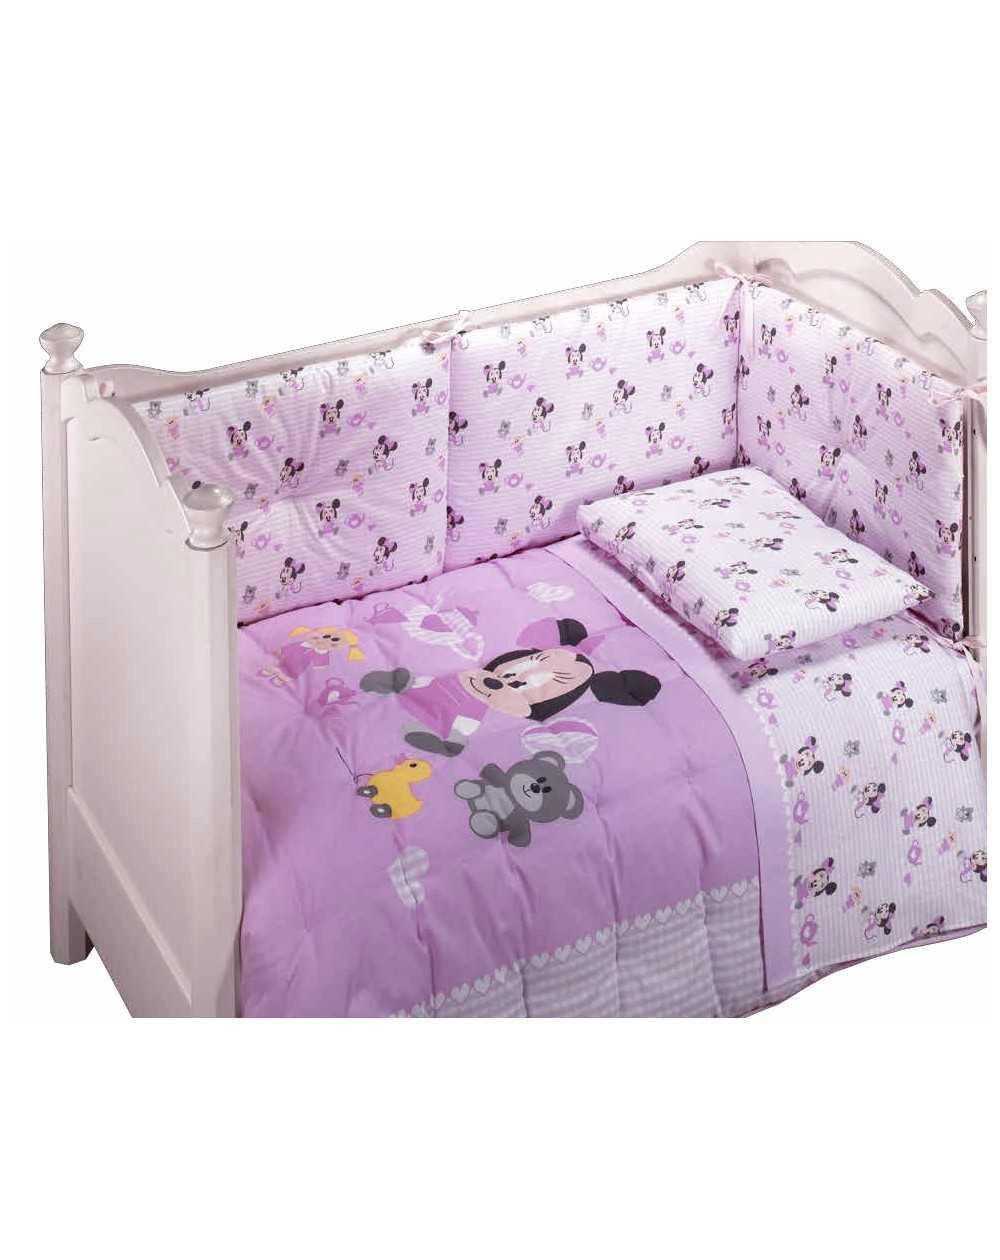 linge de lit b b set de draps minnie rasoline l f d home. Black Bedroom Furniture Sets. Home Design Ideas